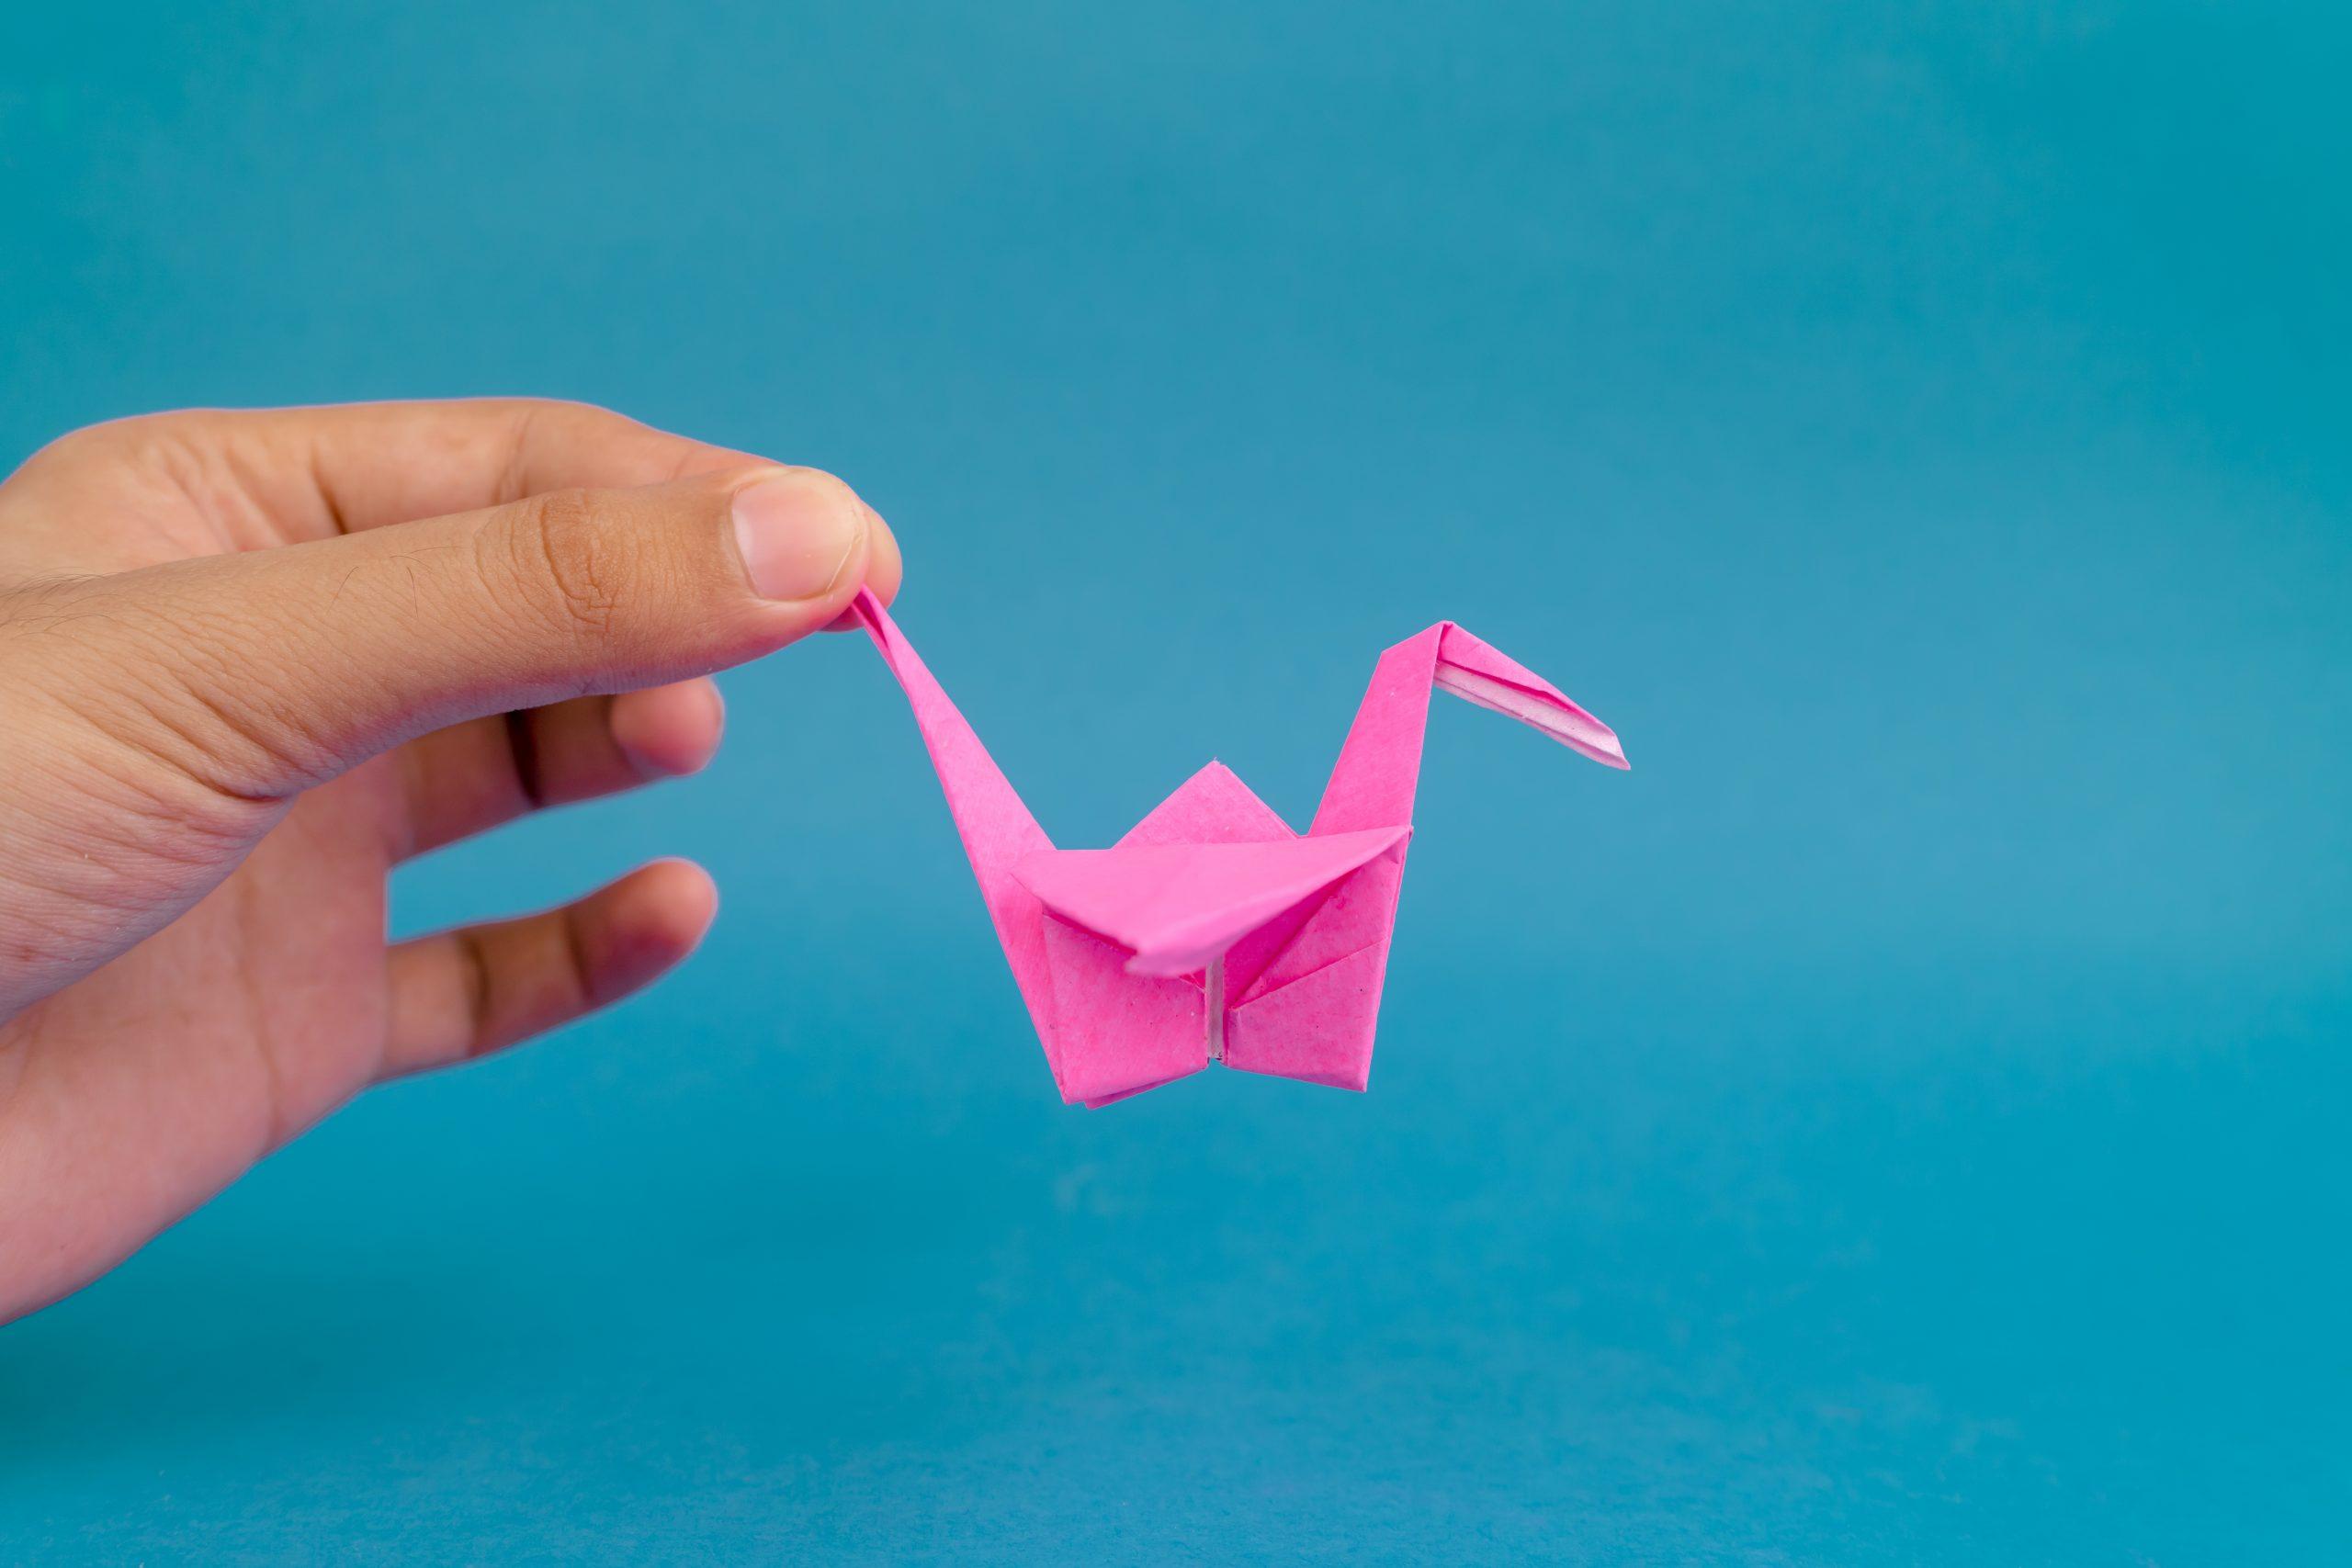 Hand holding pink crane origami